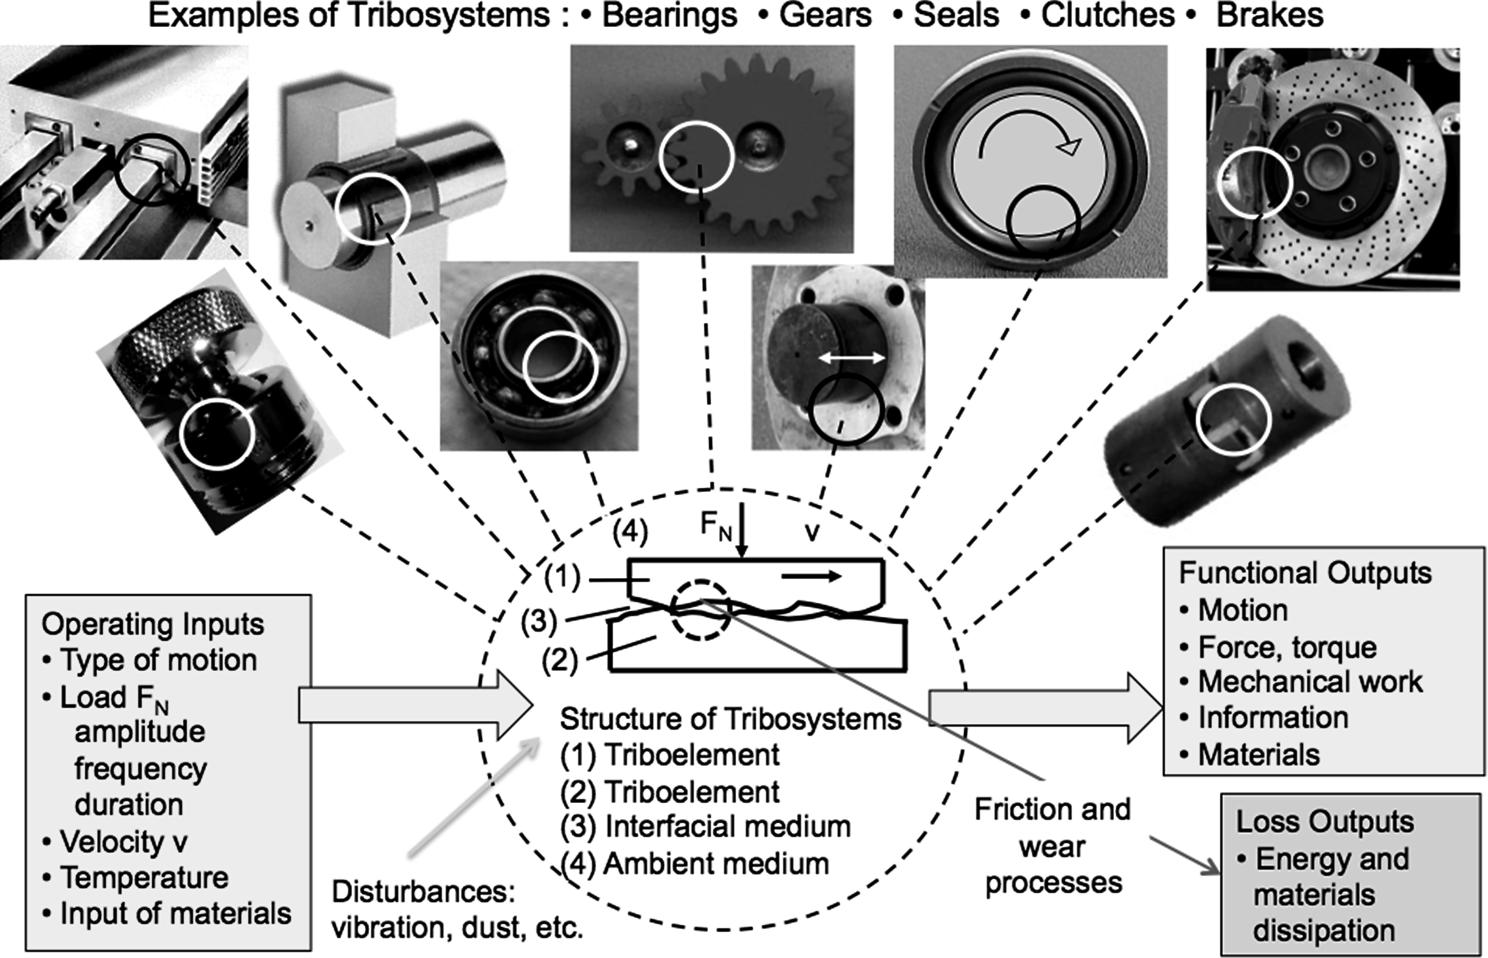 Machinery Diagnostics Fundamentals And Tribosystem Applications Springerlink